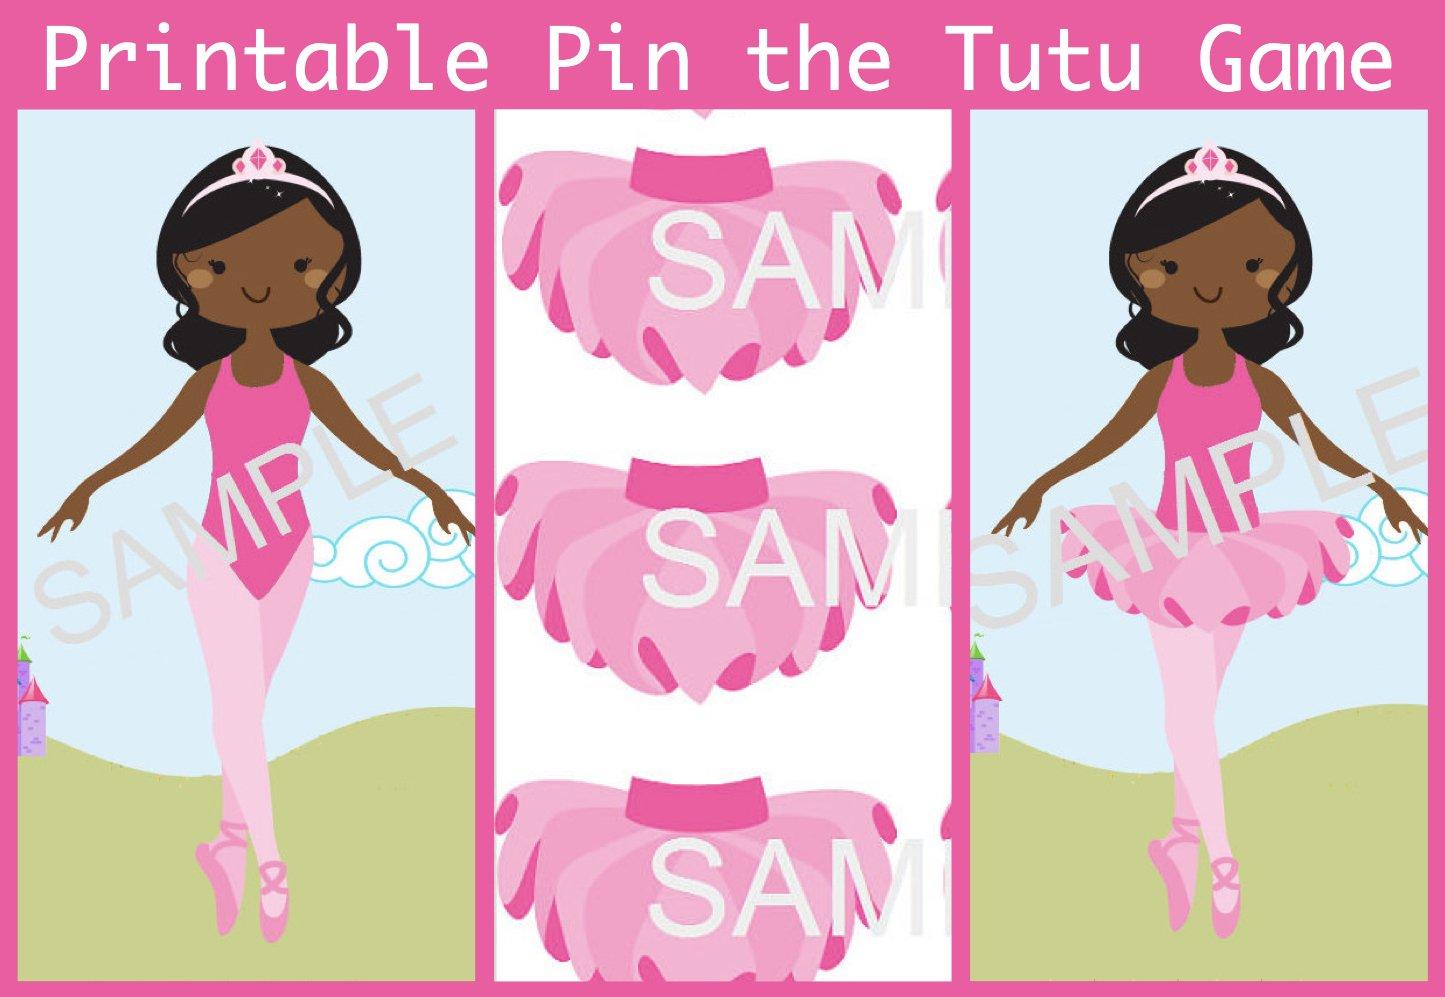 Printable Pin the Tutu Game